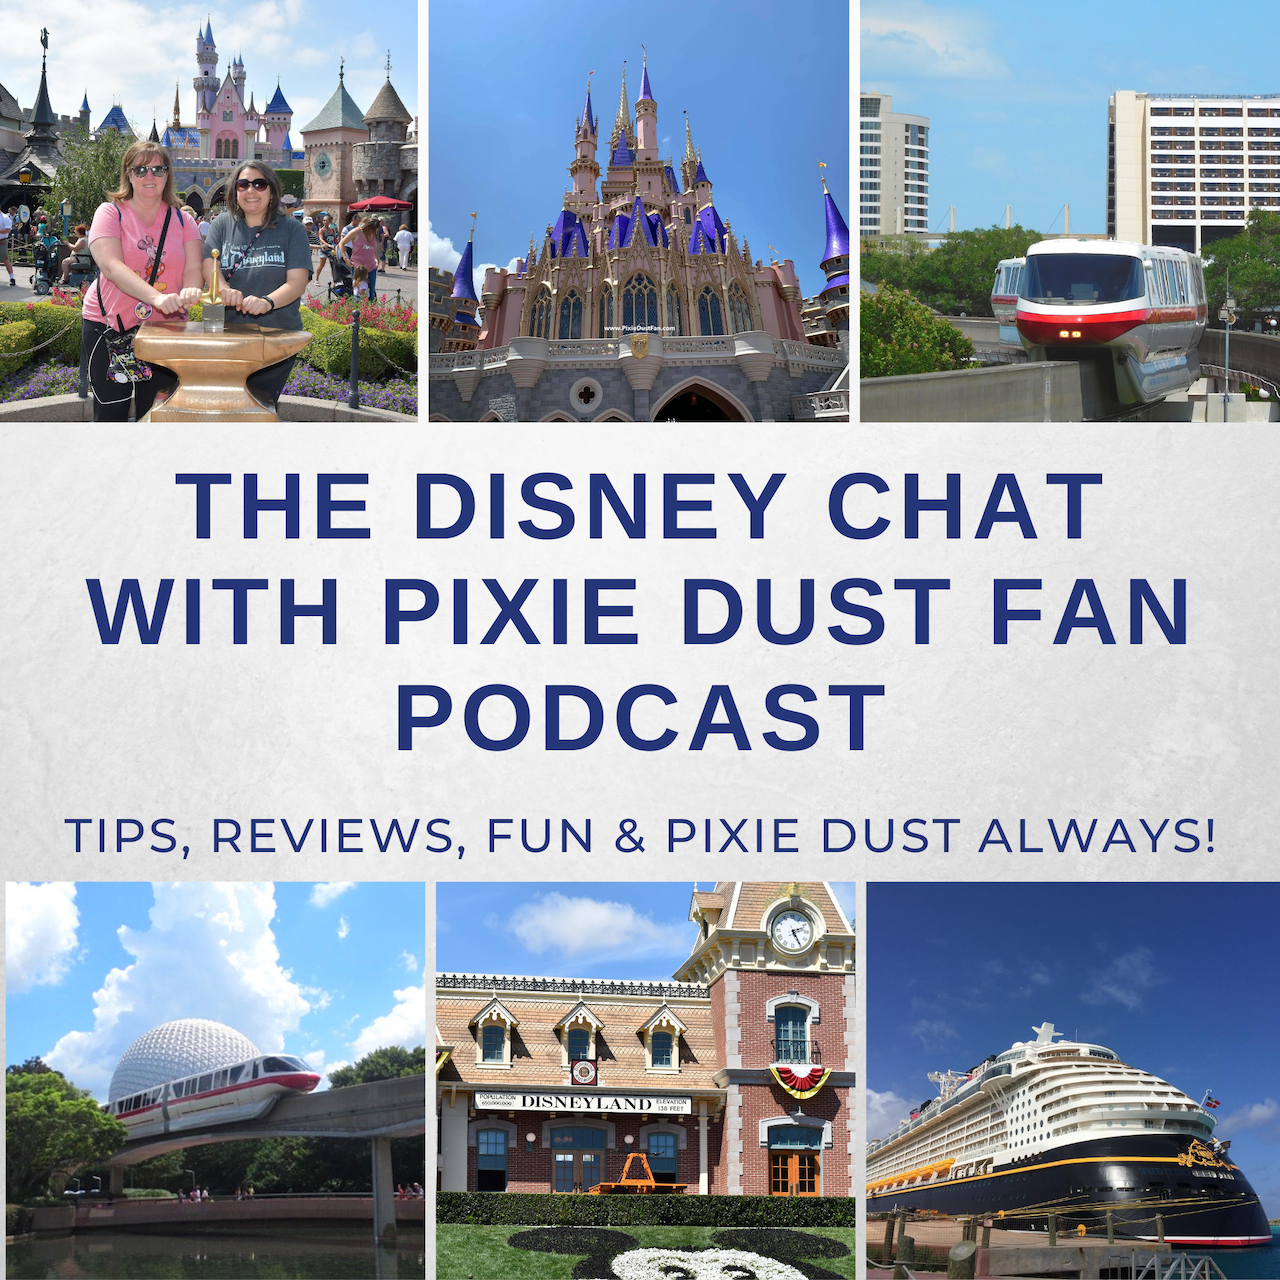 Disney Podcaster Pixie Dust Fan Celebrates 55 Episodes